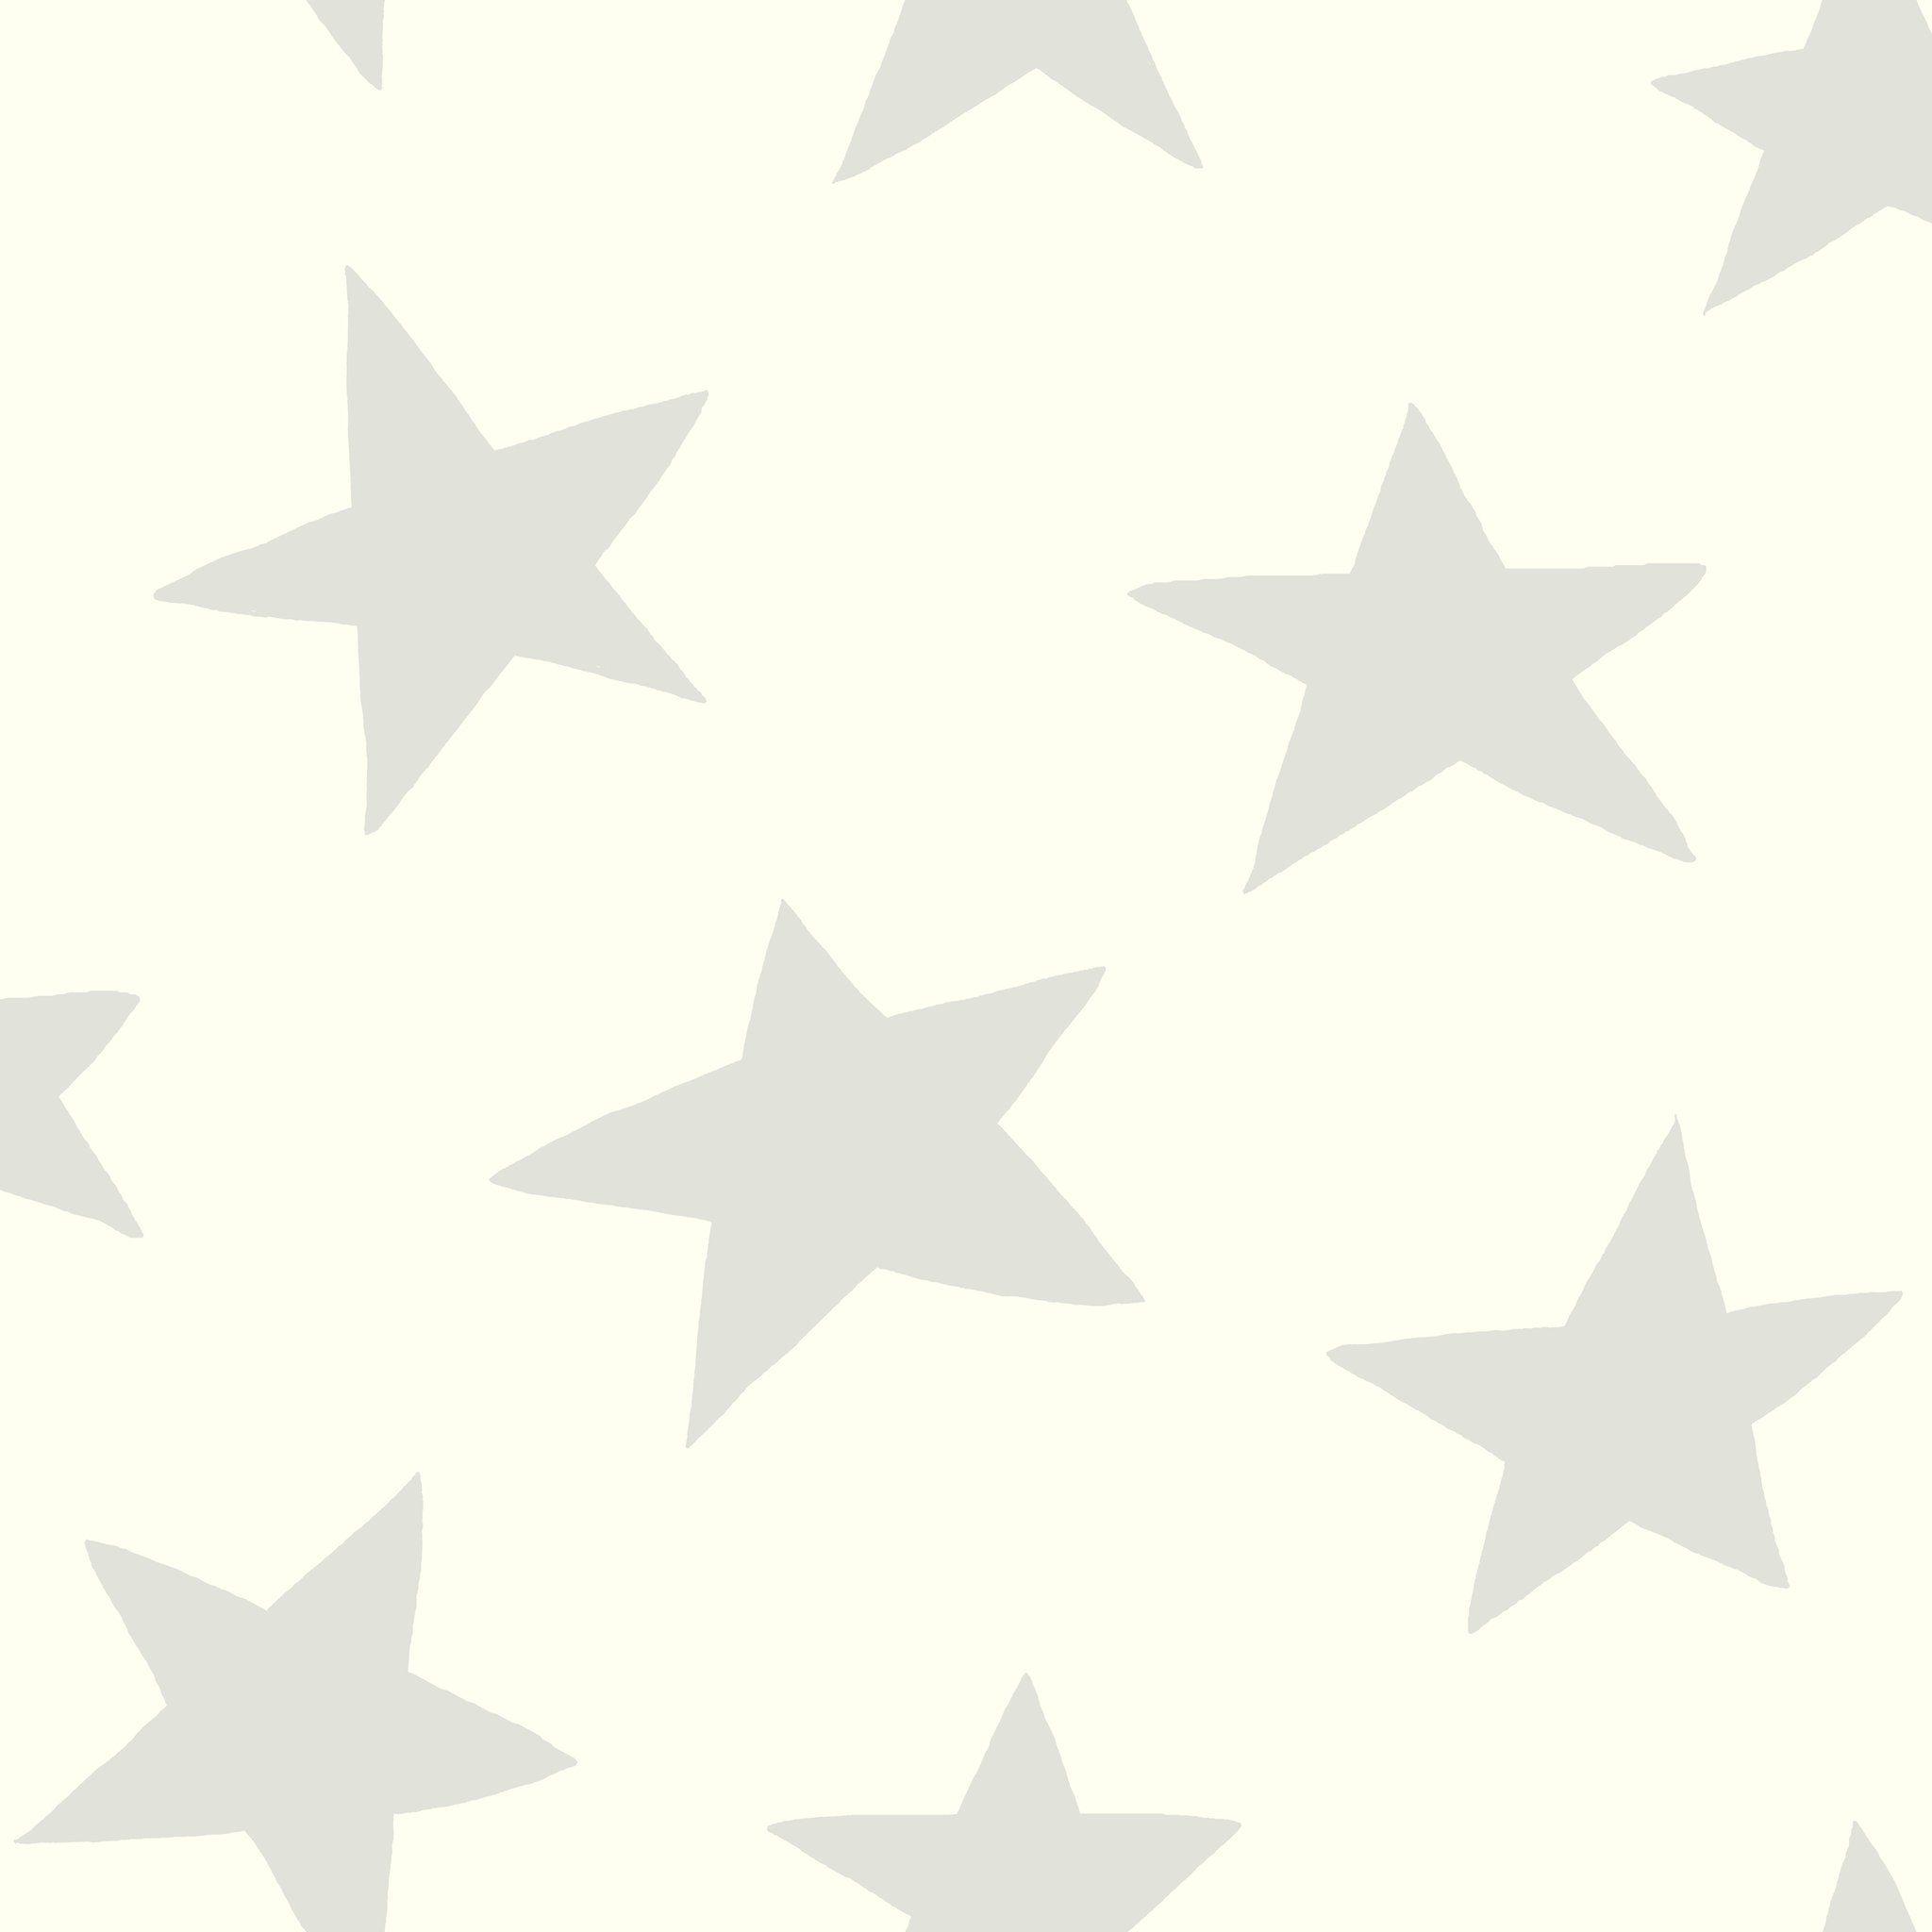 Star Grey Peel Stick Wallpaper In 2020 Star Wallpaper Peel And Stick Wallpaper Apple Watch Wallpaper